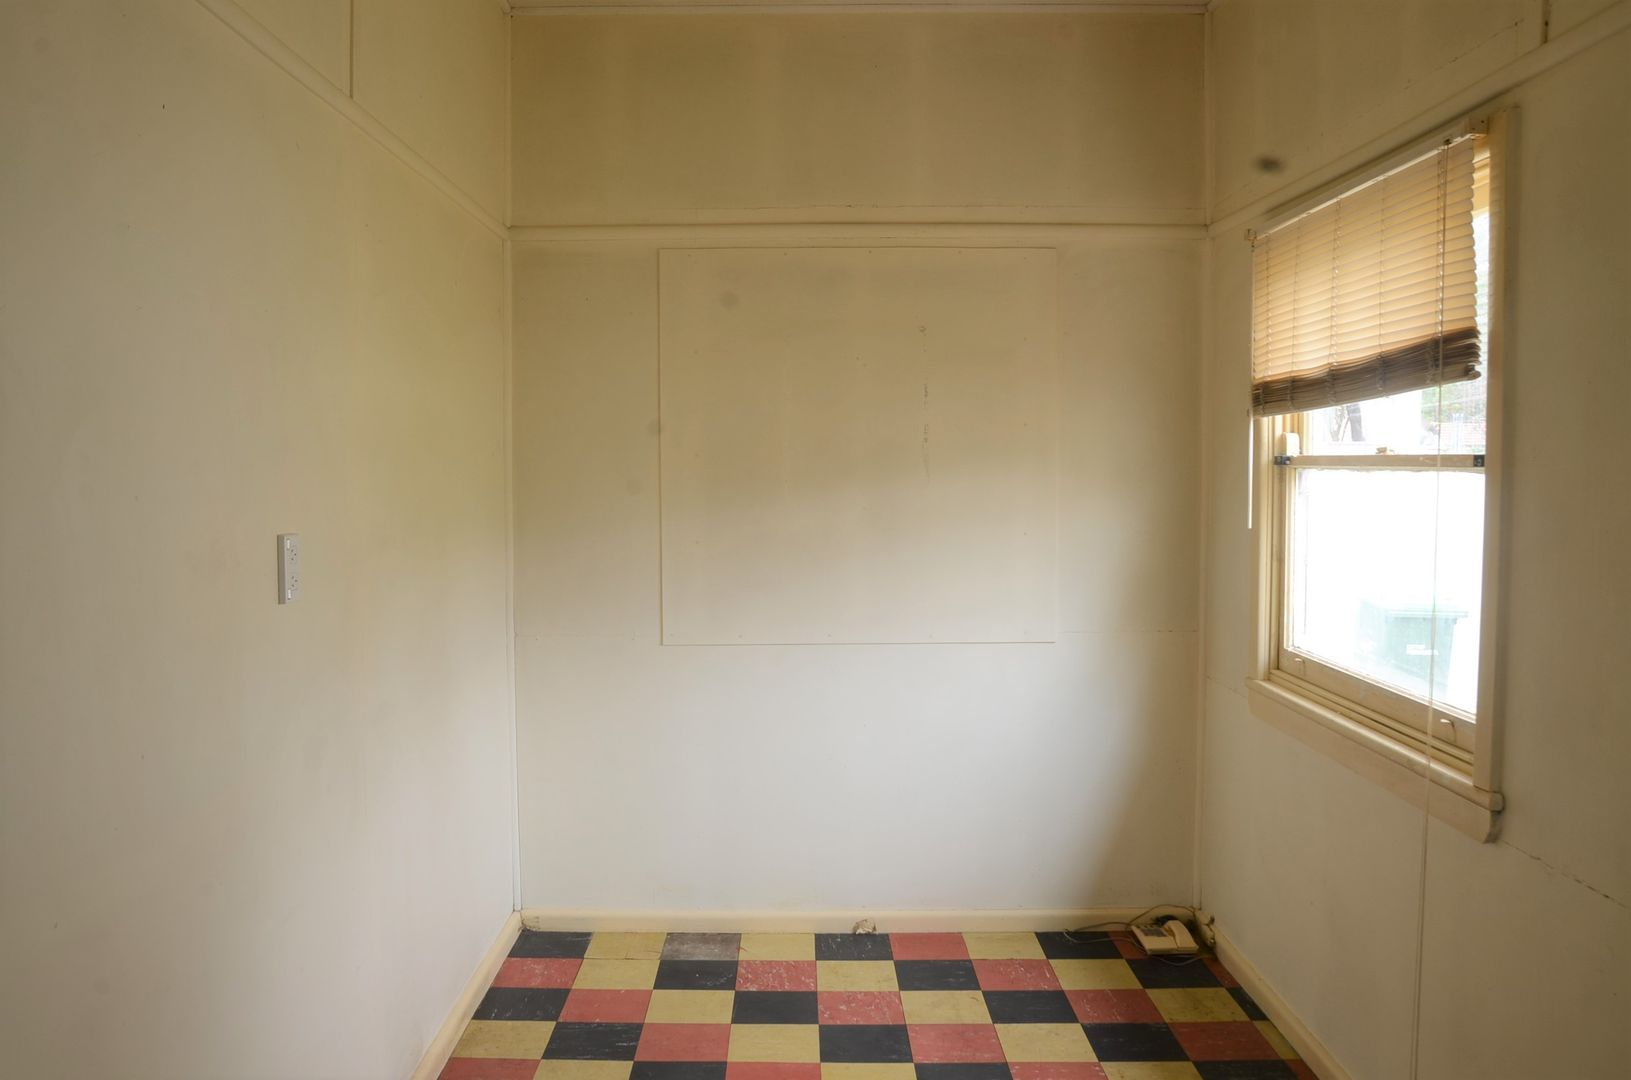 2/26 Budgeree Road, Toongabbie NSW 2146, Image 2